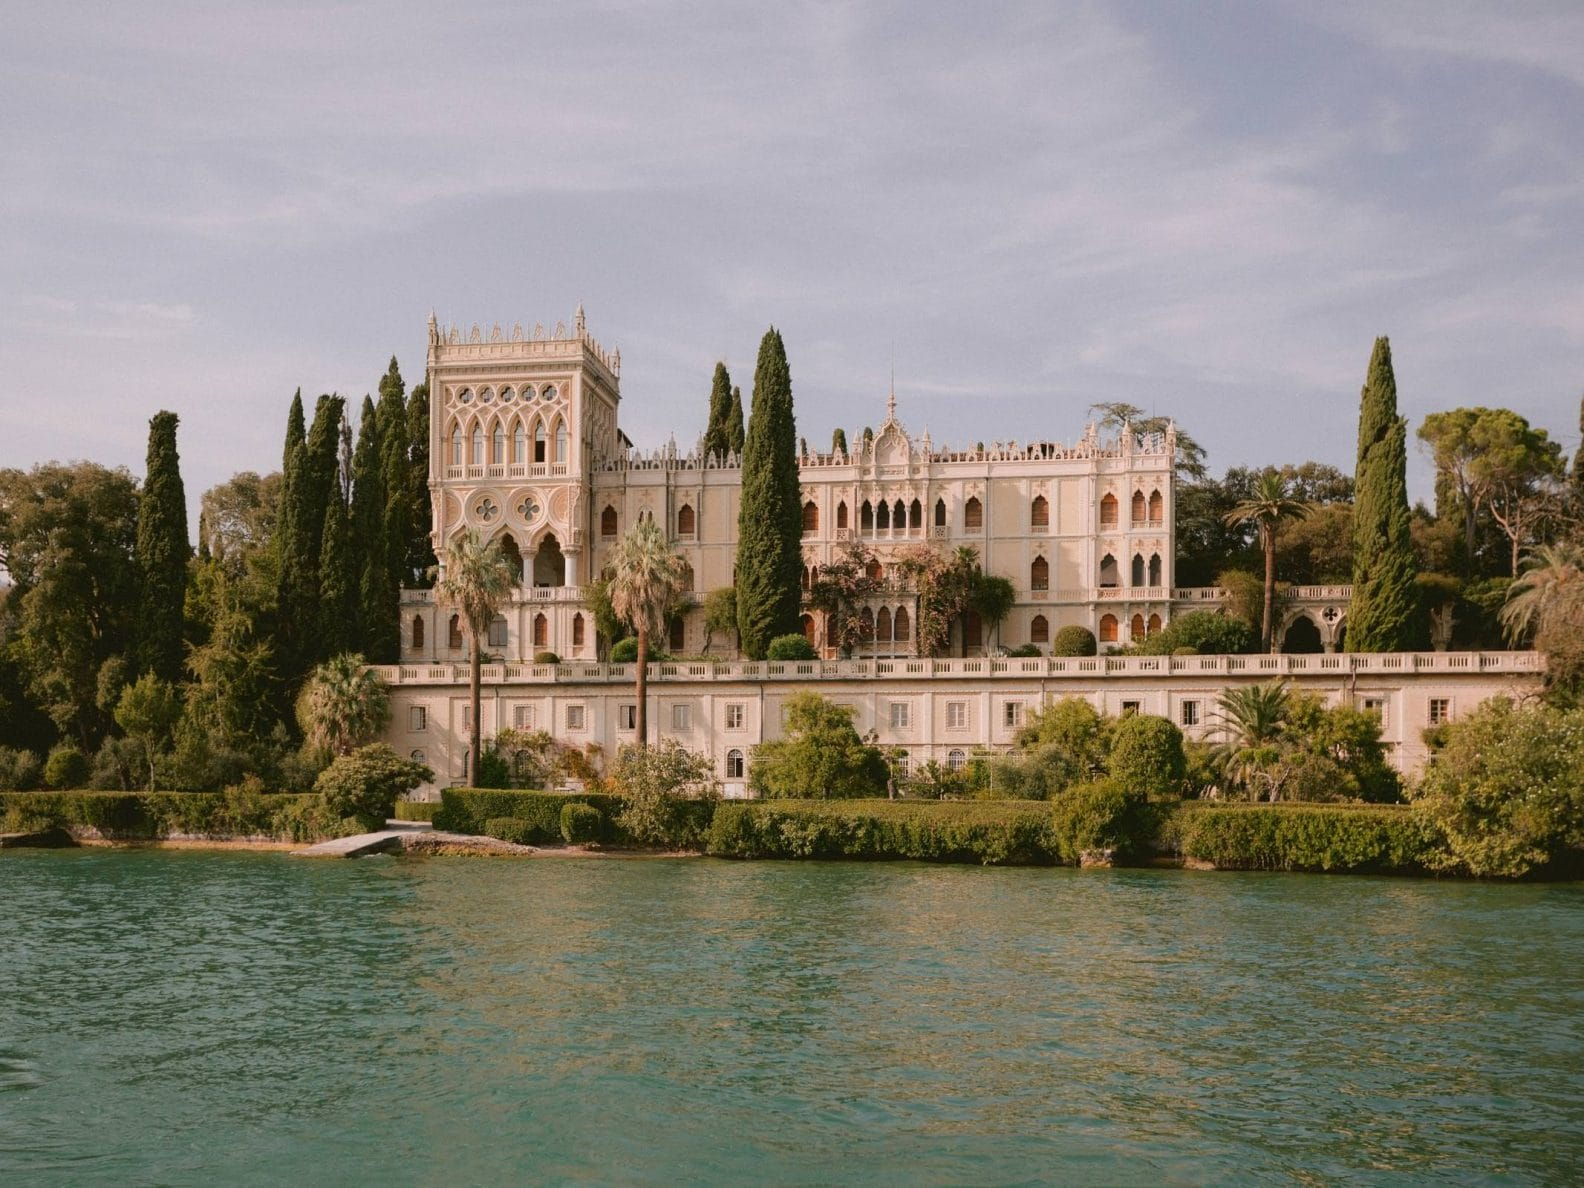 Isola del Garda is the best wedding venue on the Garda Lake